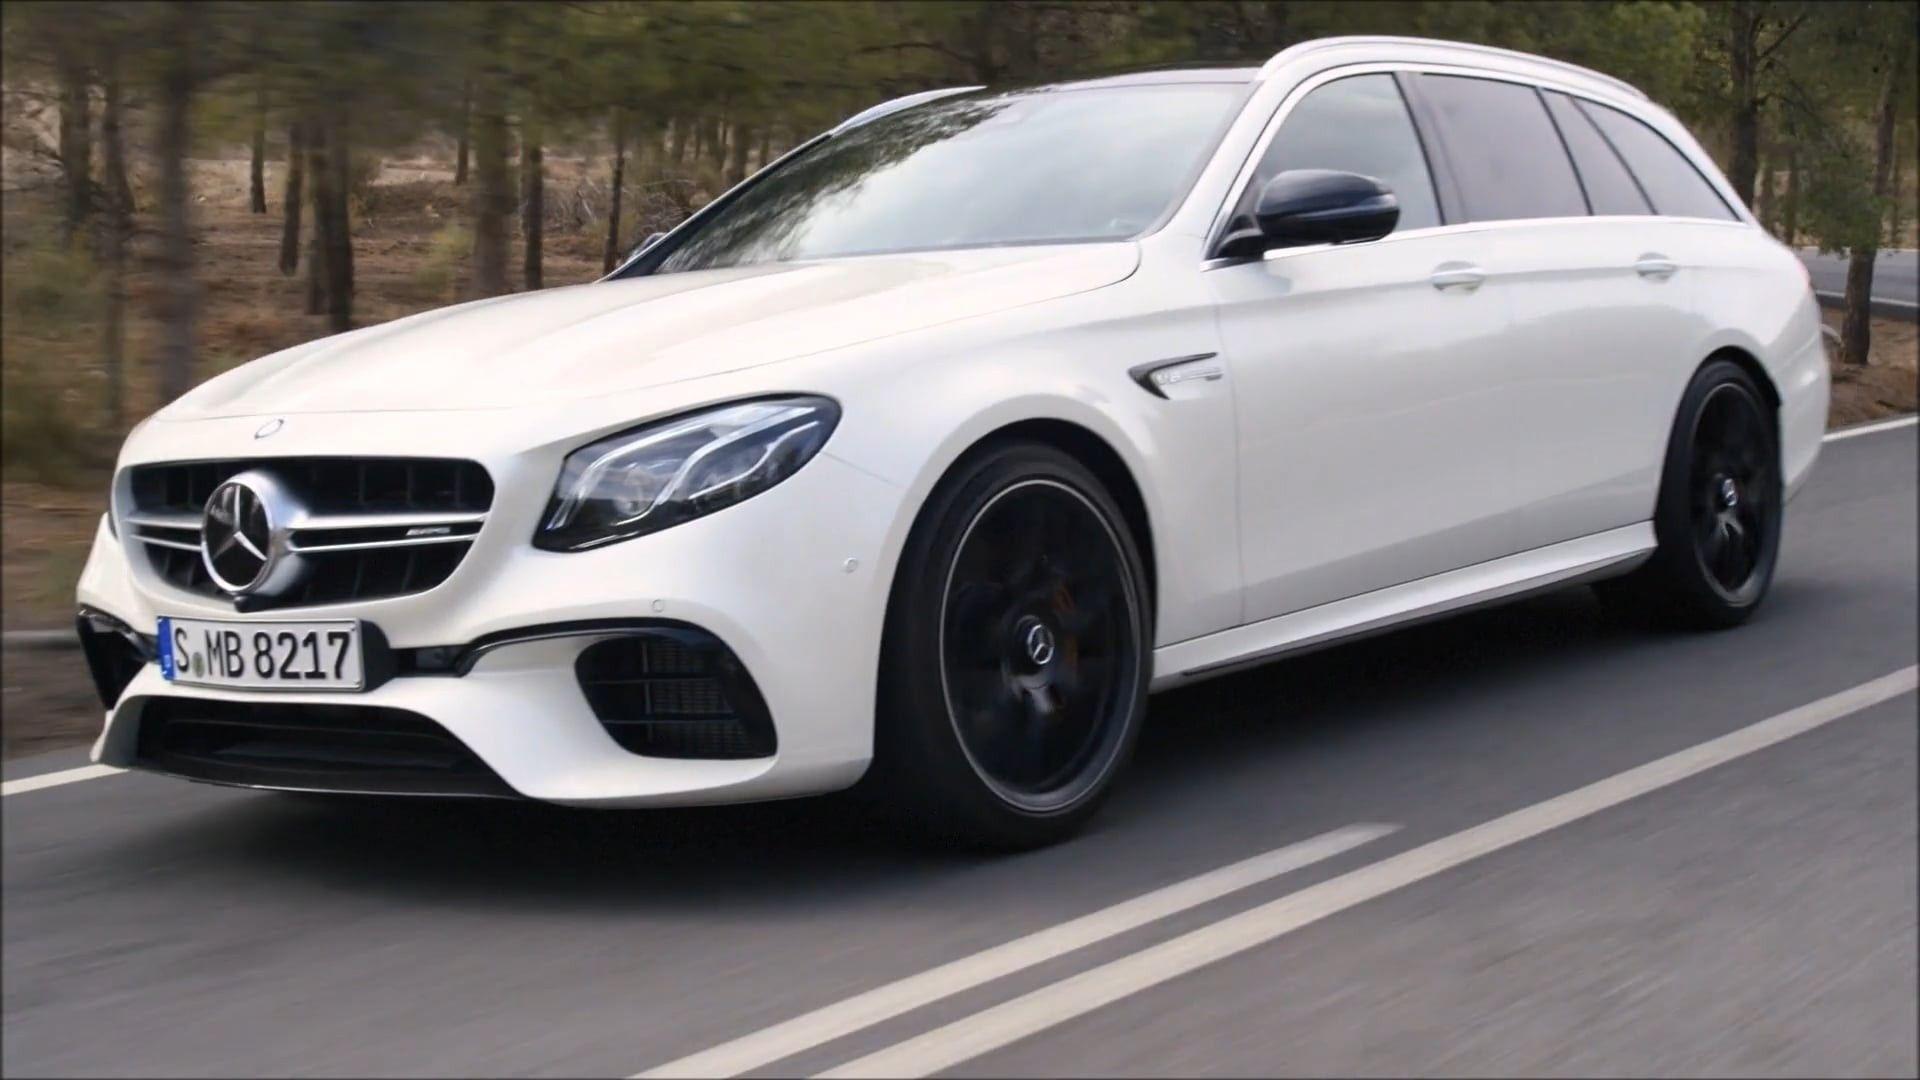 Mercedes-AMG E 63 S Wagon 2019